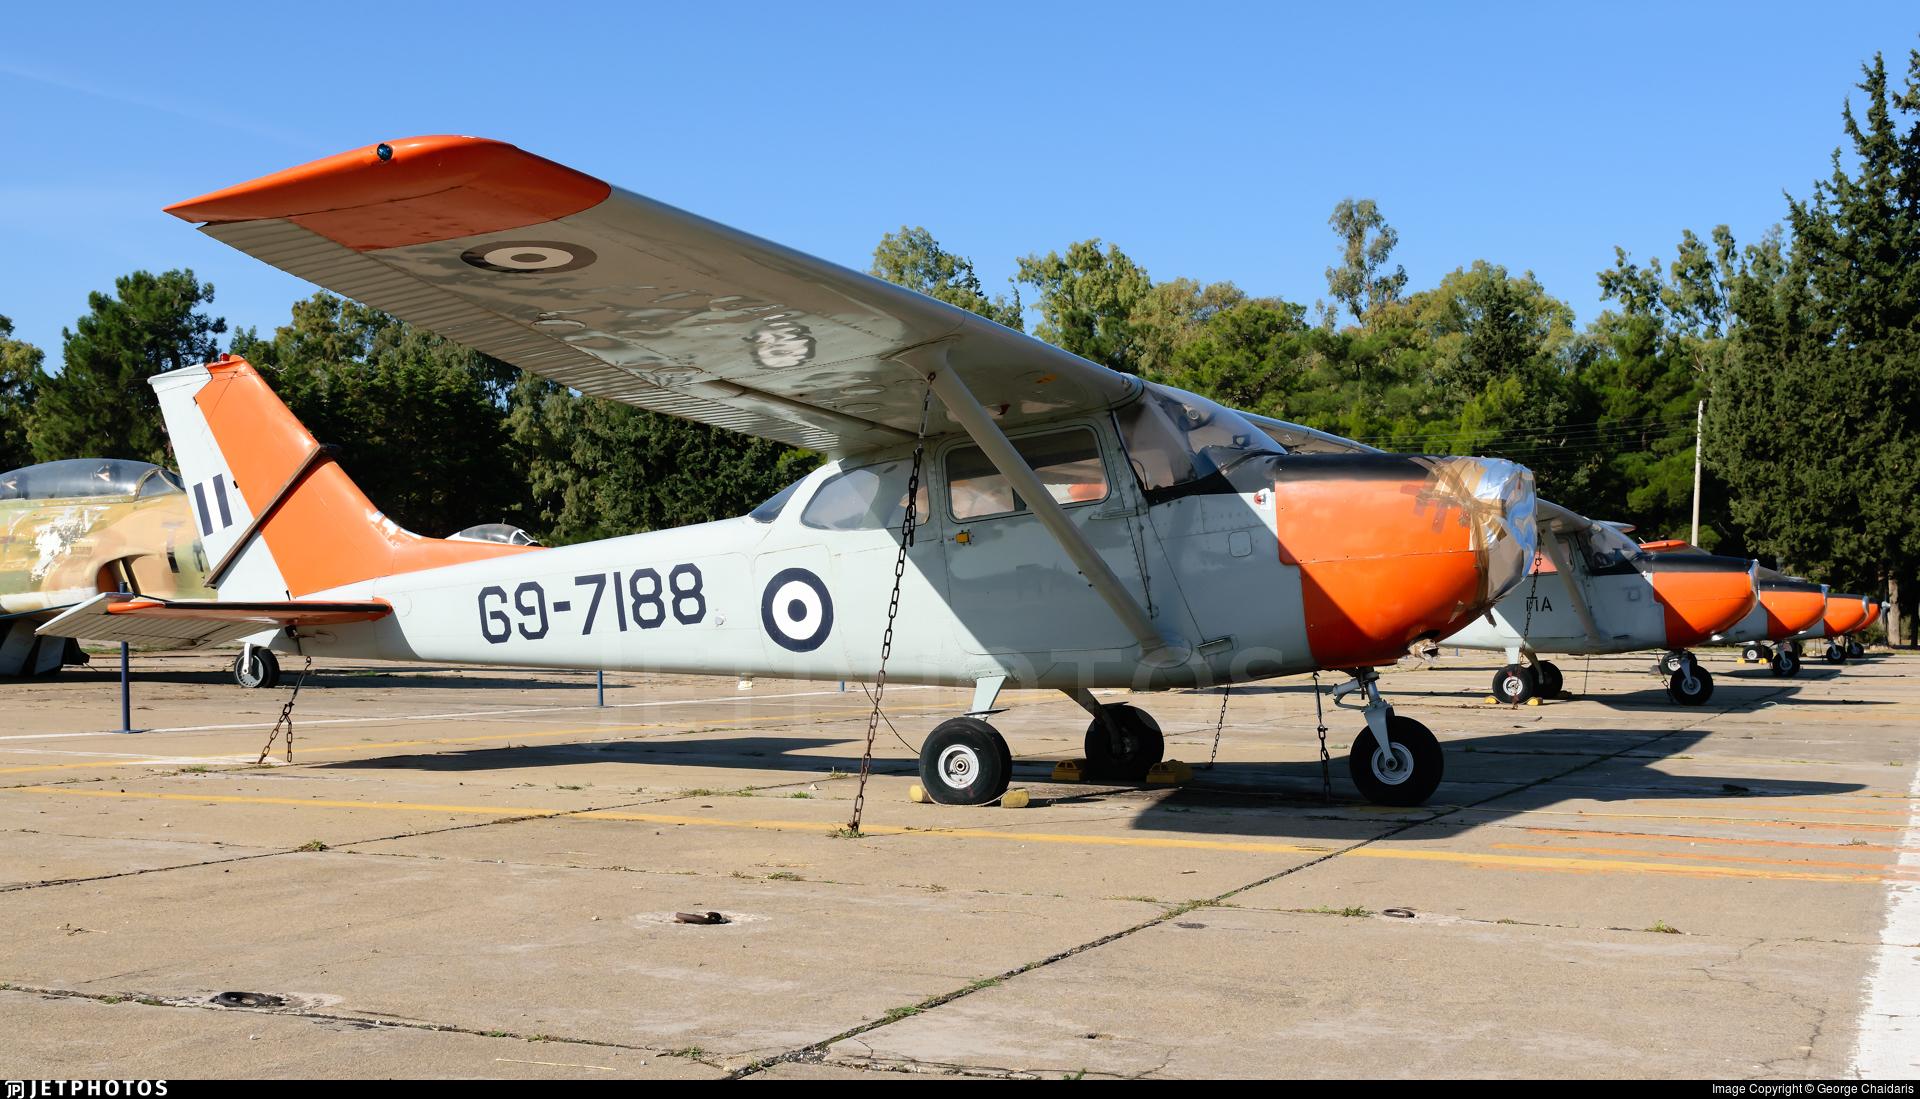 69-7188 - Cessna T-41D Mescalero - Greece - Air Force